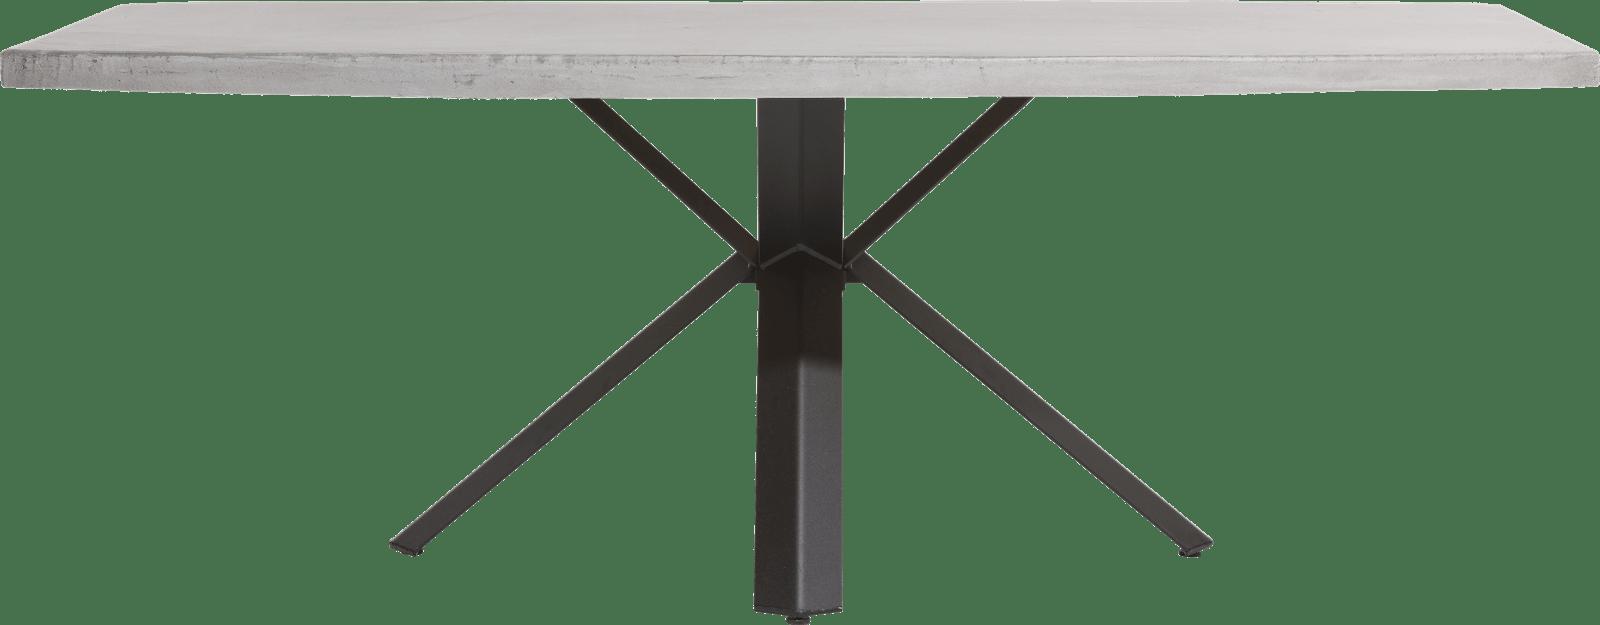 Maddox - table 220 x 100 cm - beton - pied forme etoile